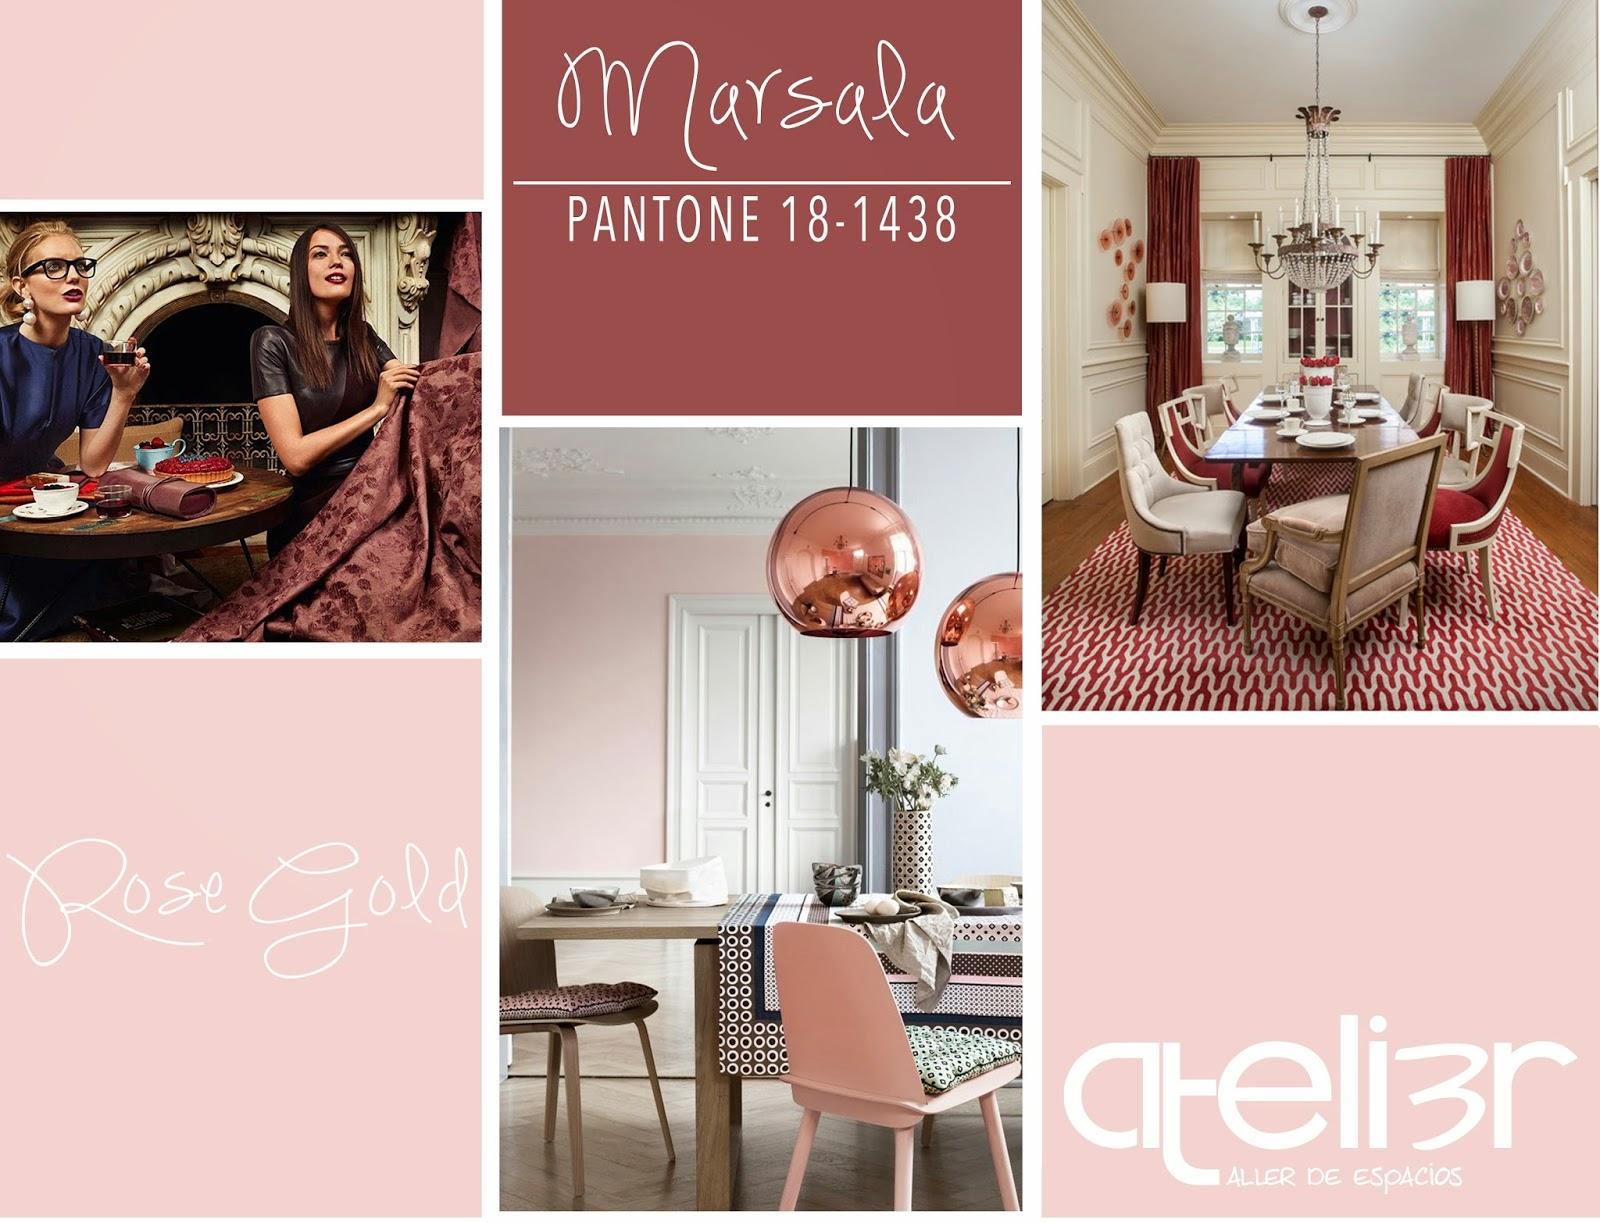 Pantone 2015, Marsala, rose gold, oro rosado,interior design guatemala, interiores guatemala, guatemala diseño de interiores, diseño de interiores guatemala, decoración guatelamala, Atelier Taller de Espacios